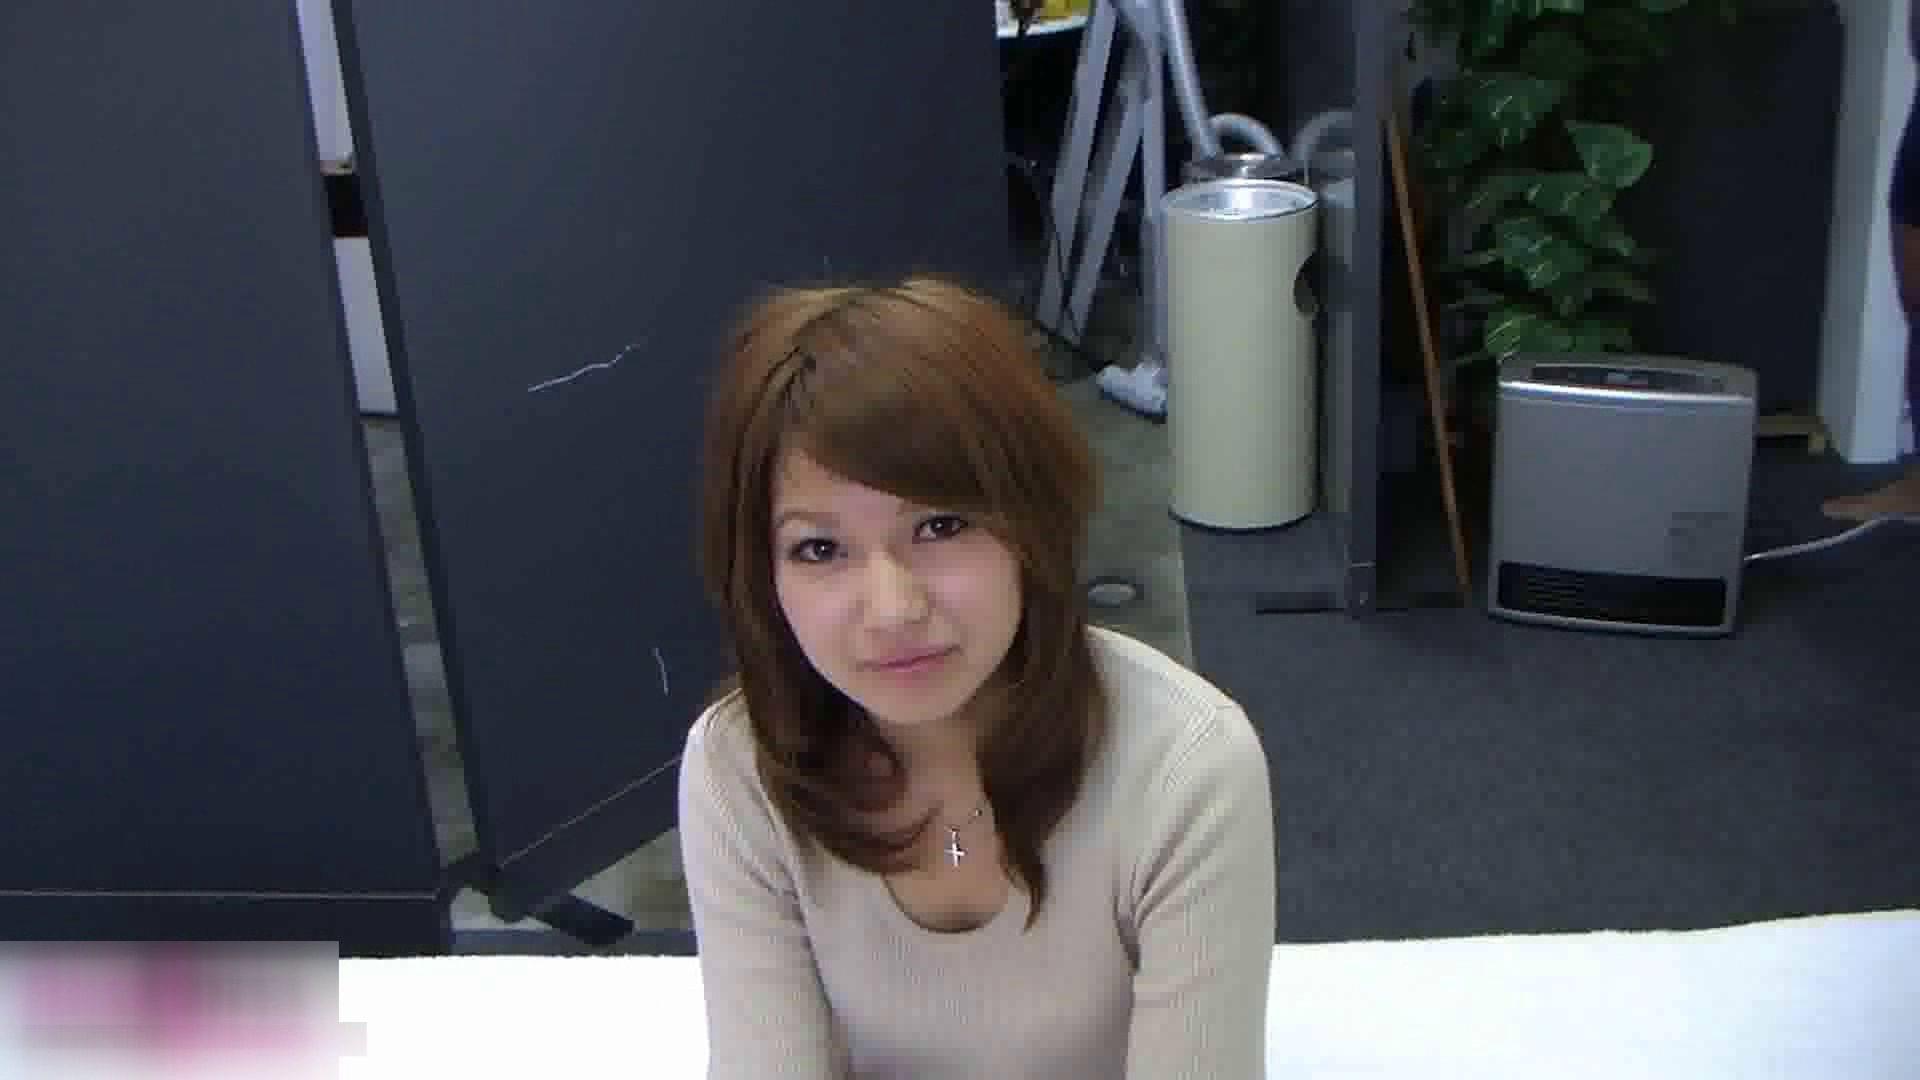 S級厳選美女ビッチガールVol.05 0   0  44画像 4